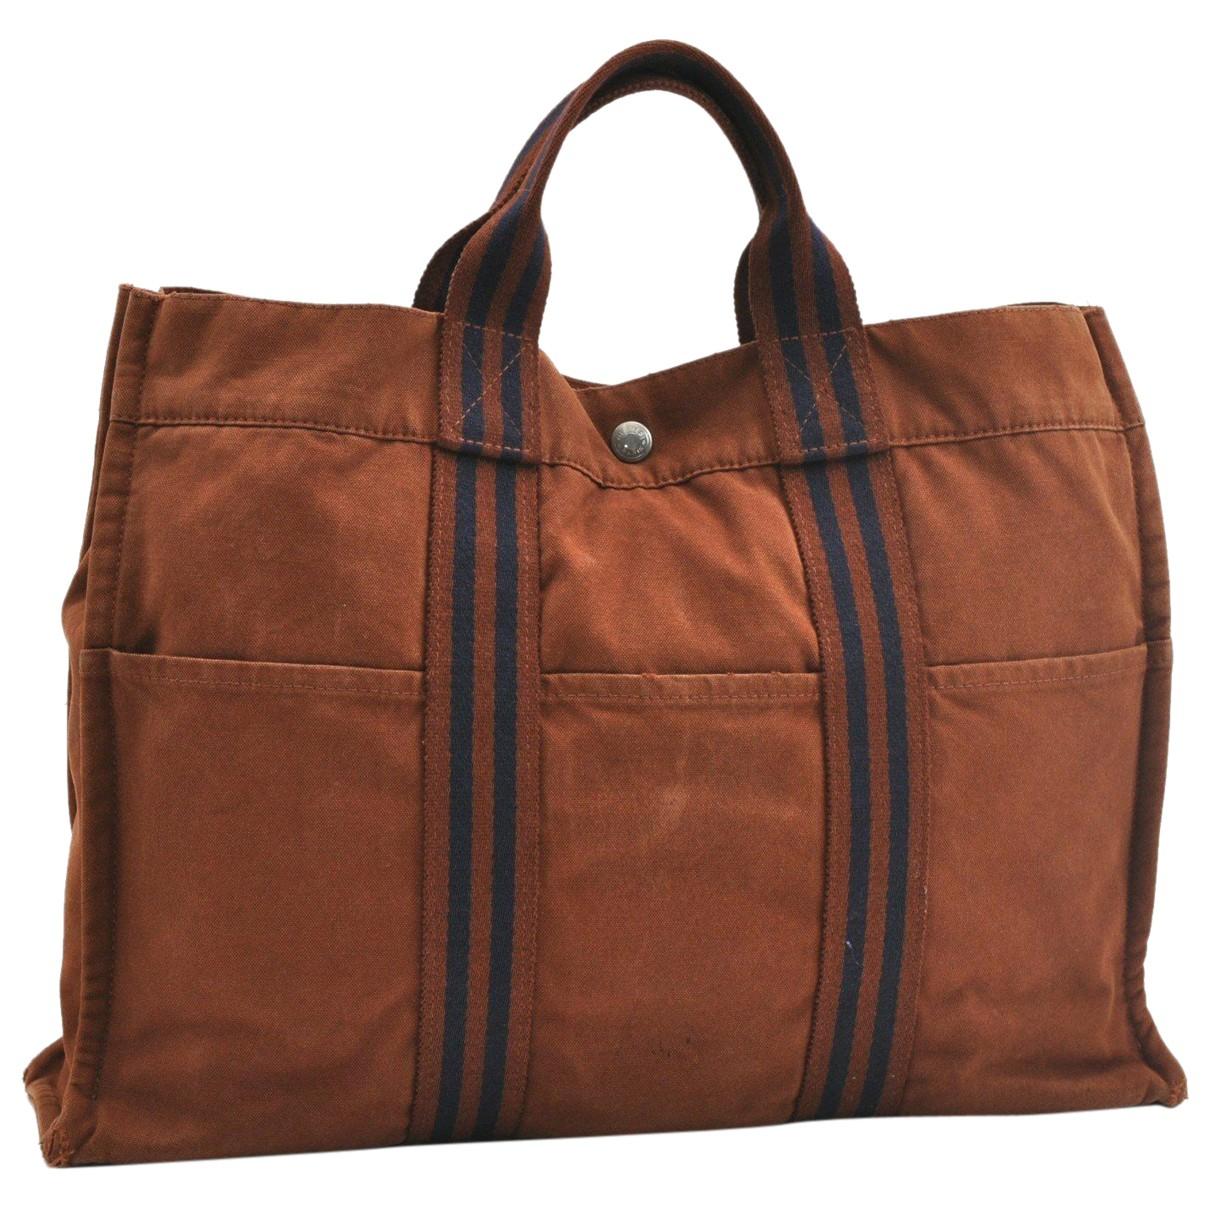 Hermès N Brown Cloth handbag for Women N